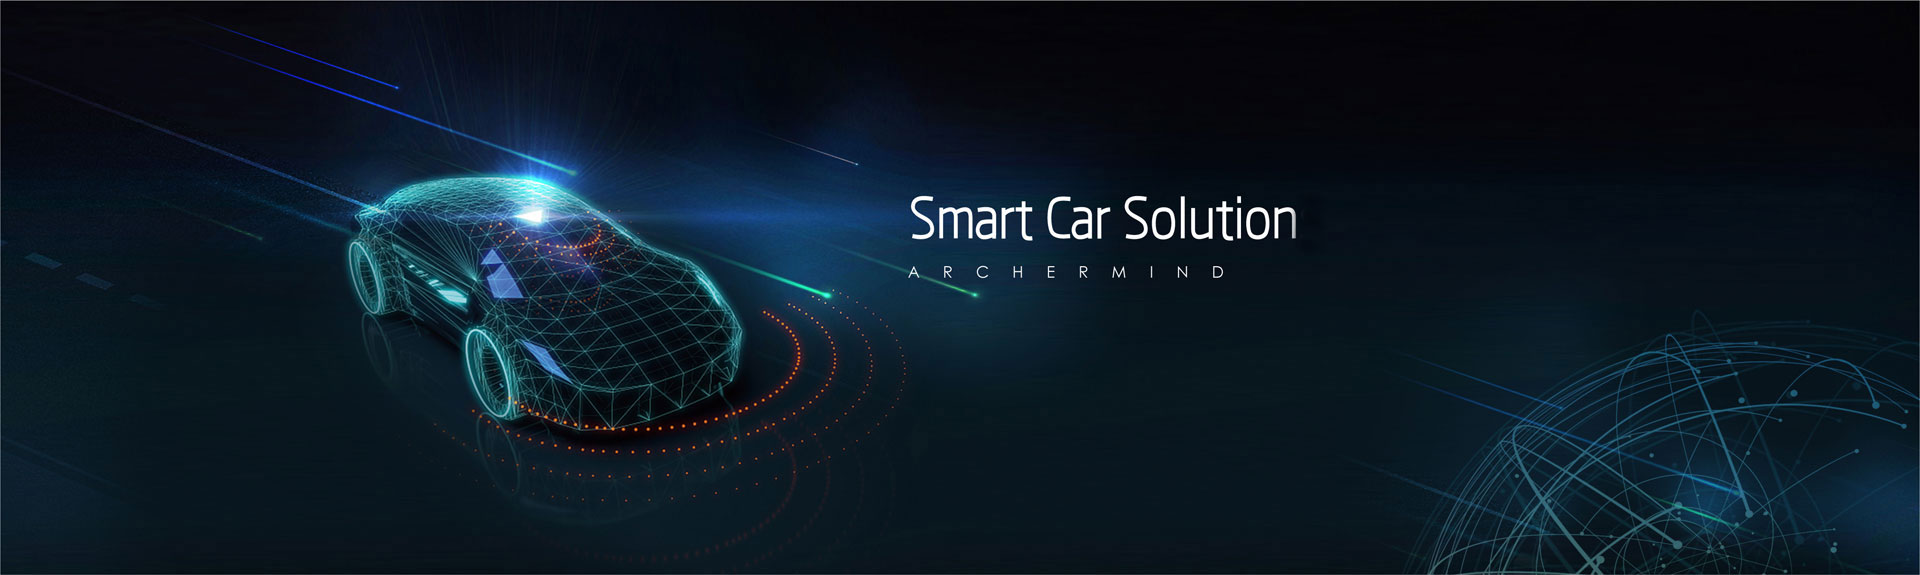 smart-car-solutions_en_v1